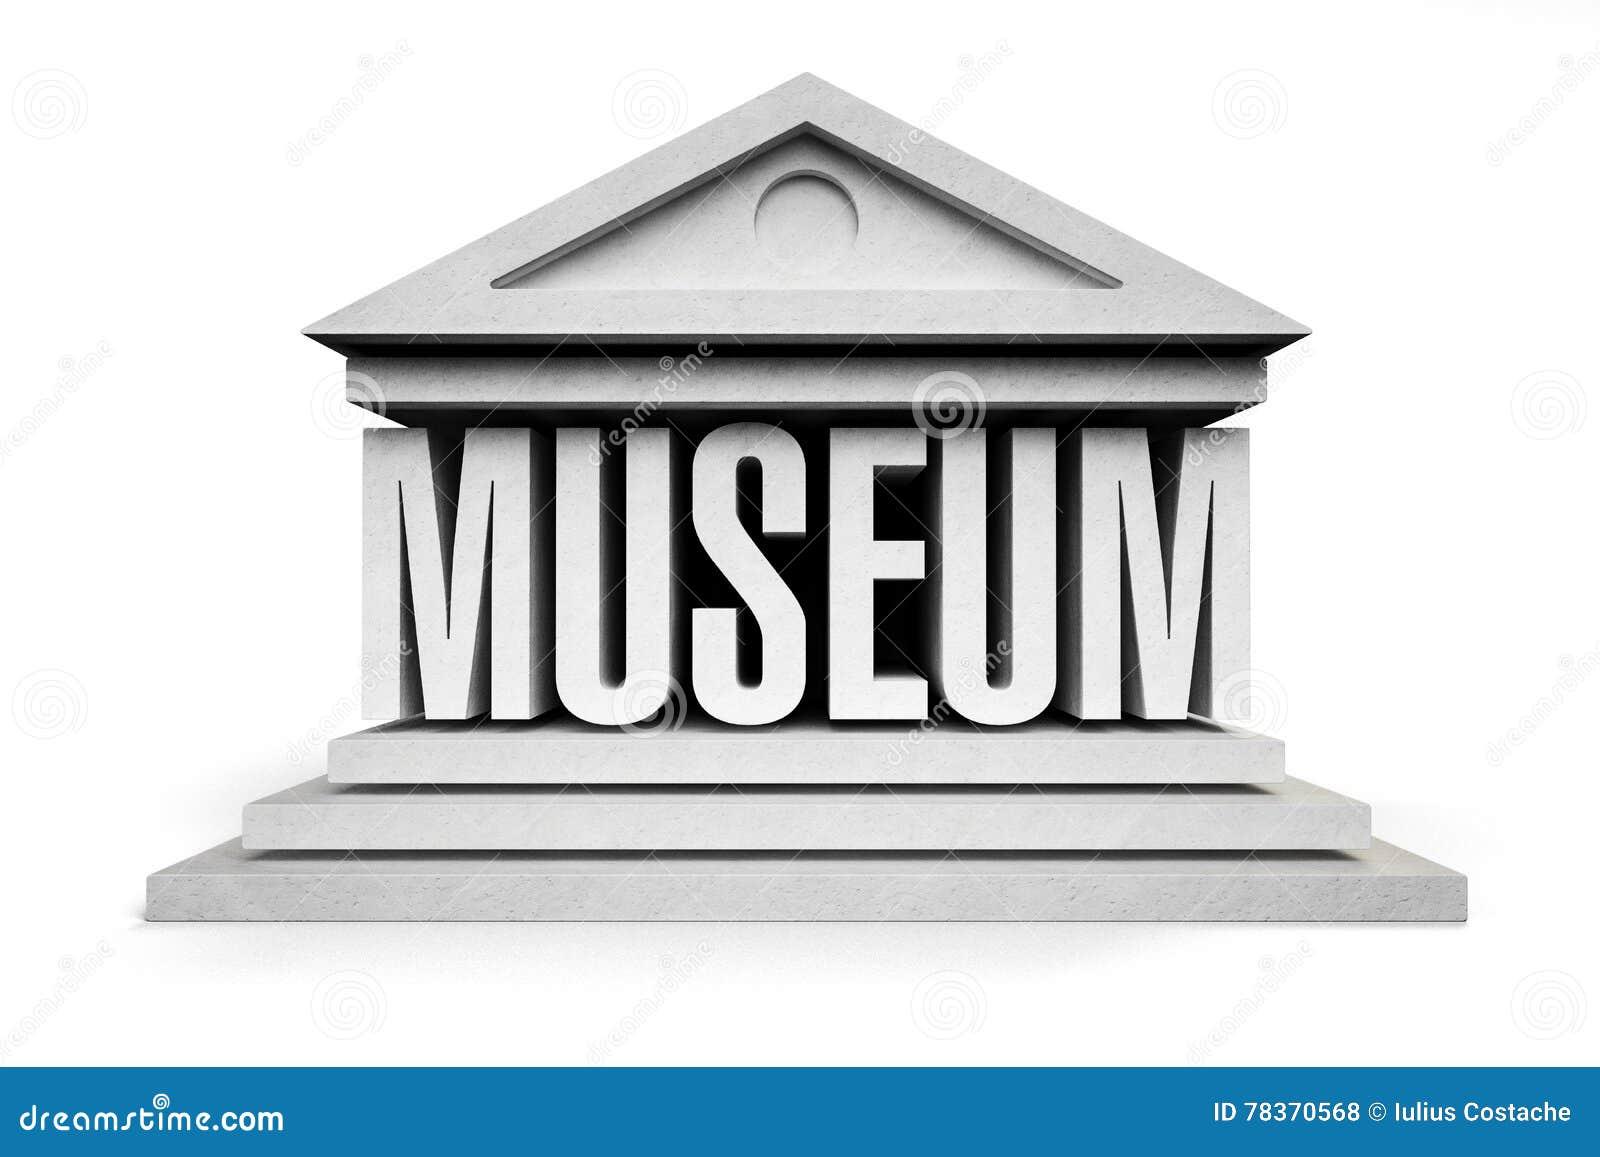 Museum stock illustration  Illustration of classic, sign - 78370568